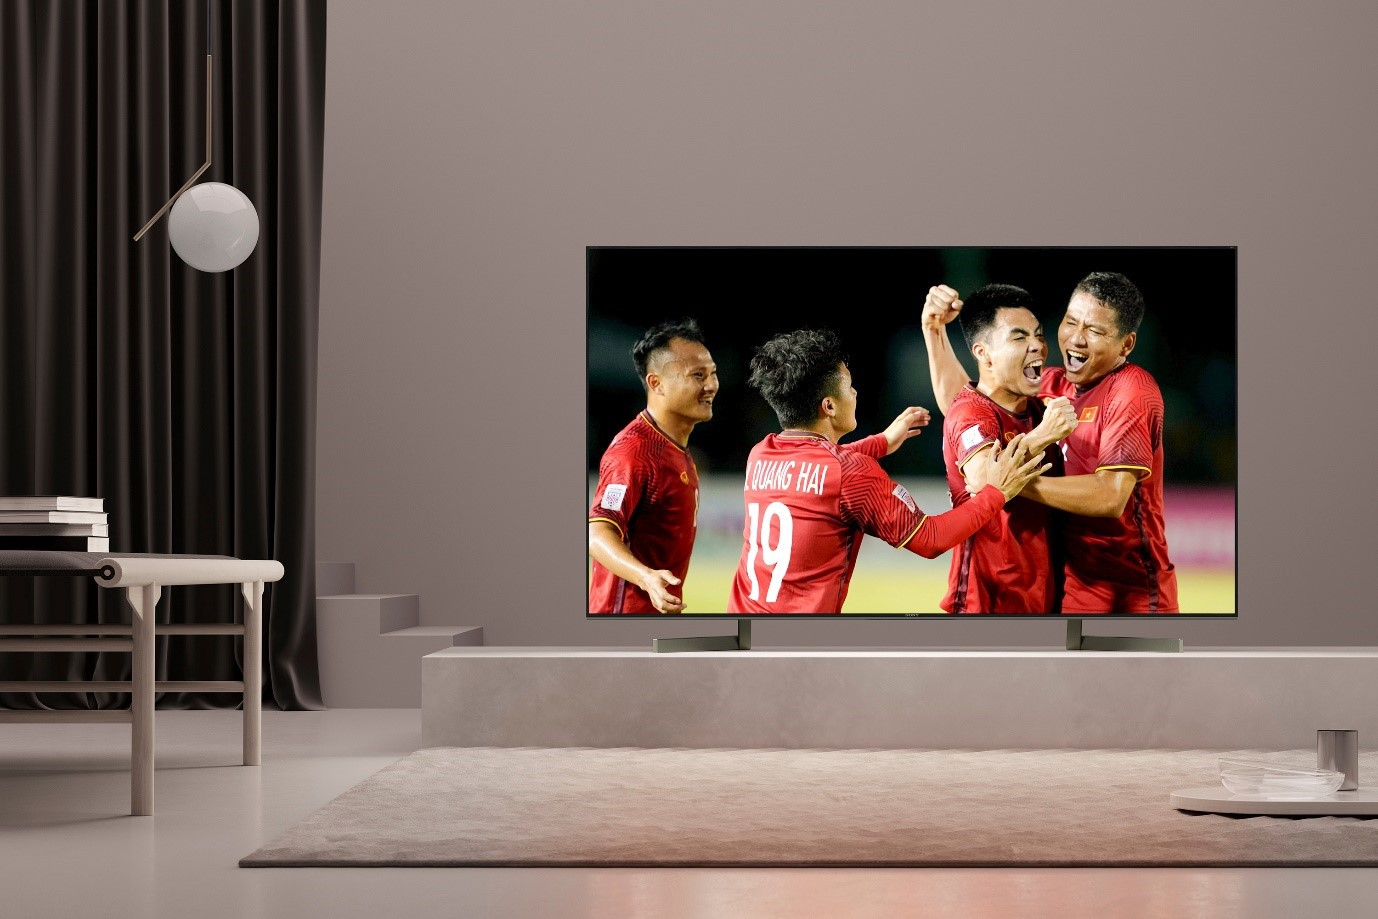 tivi-giam-gia-tuan-nay-android-tv-uu-dai-soc-cung-smart-tv-2